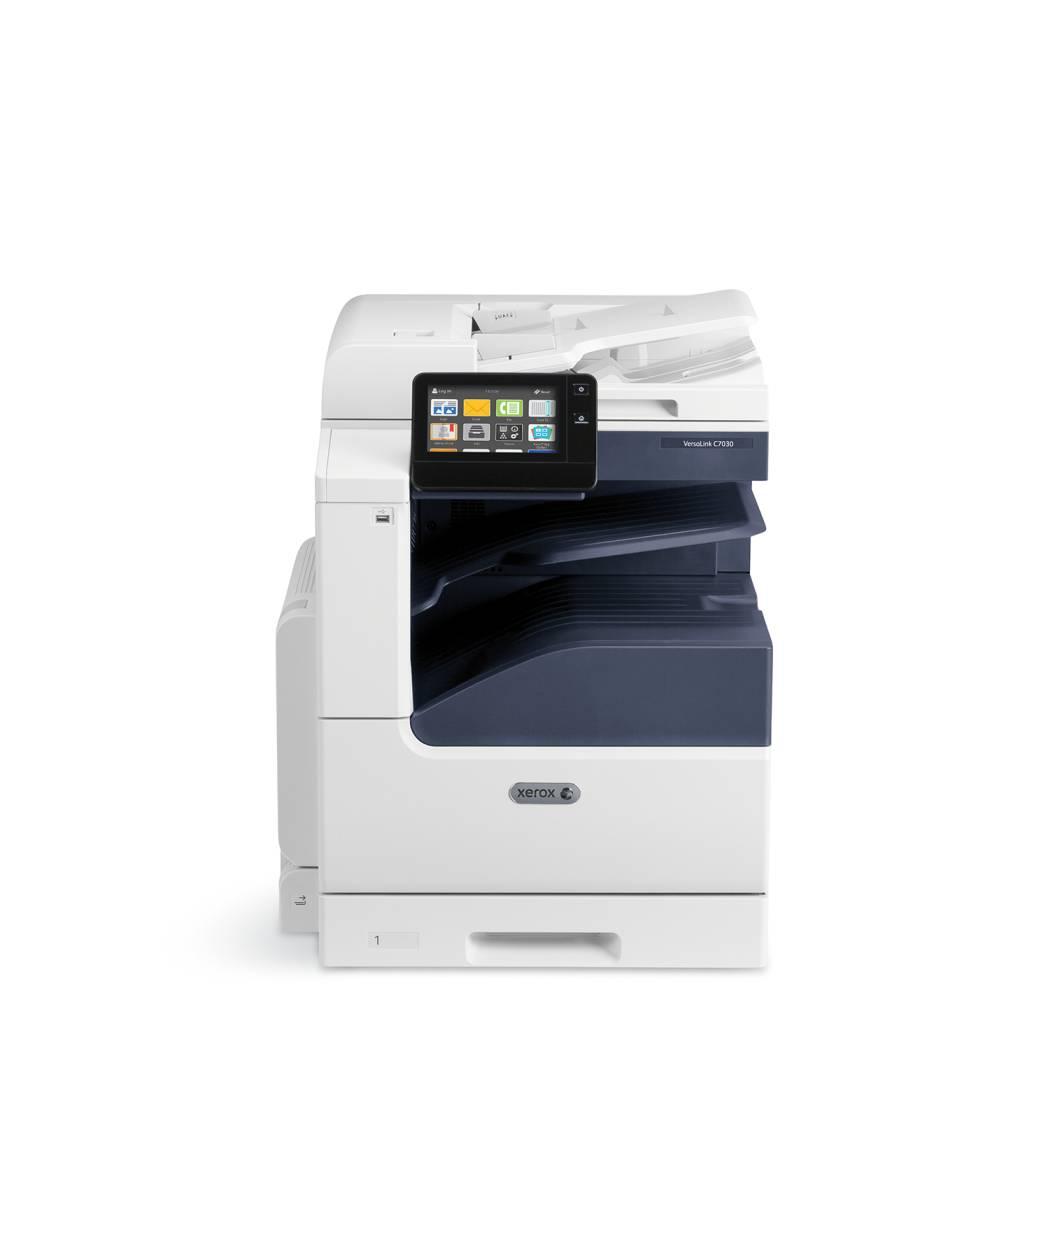 Impresora multifunción Xerox VersaLink C7030